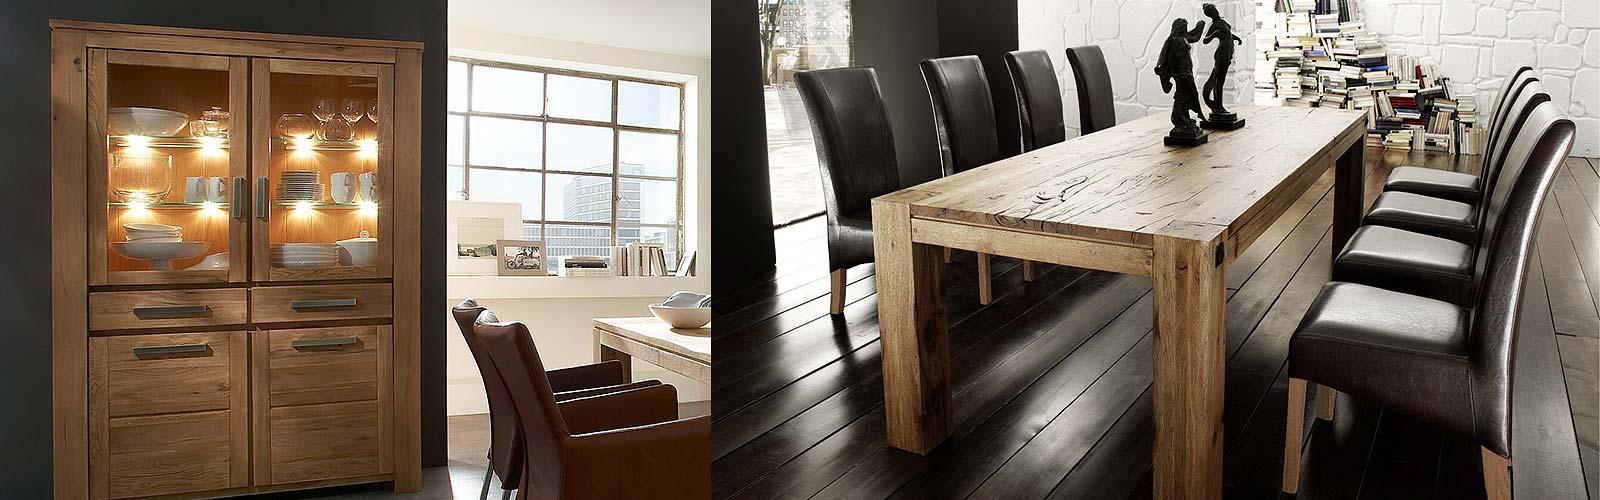 massivholzm bel aus eiche pflege tipps. Black Bedroom Furniture Sets. Home Design Ideas